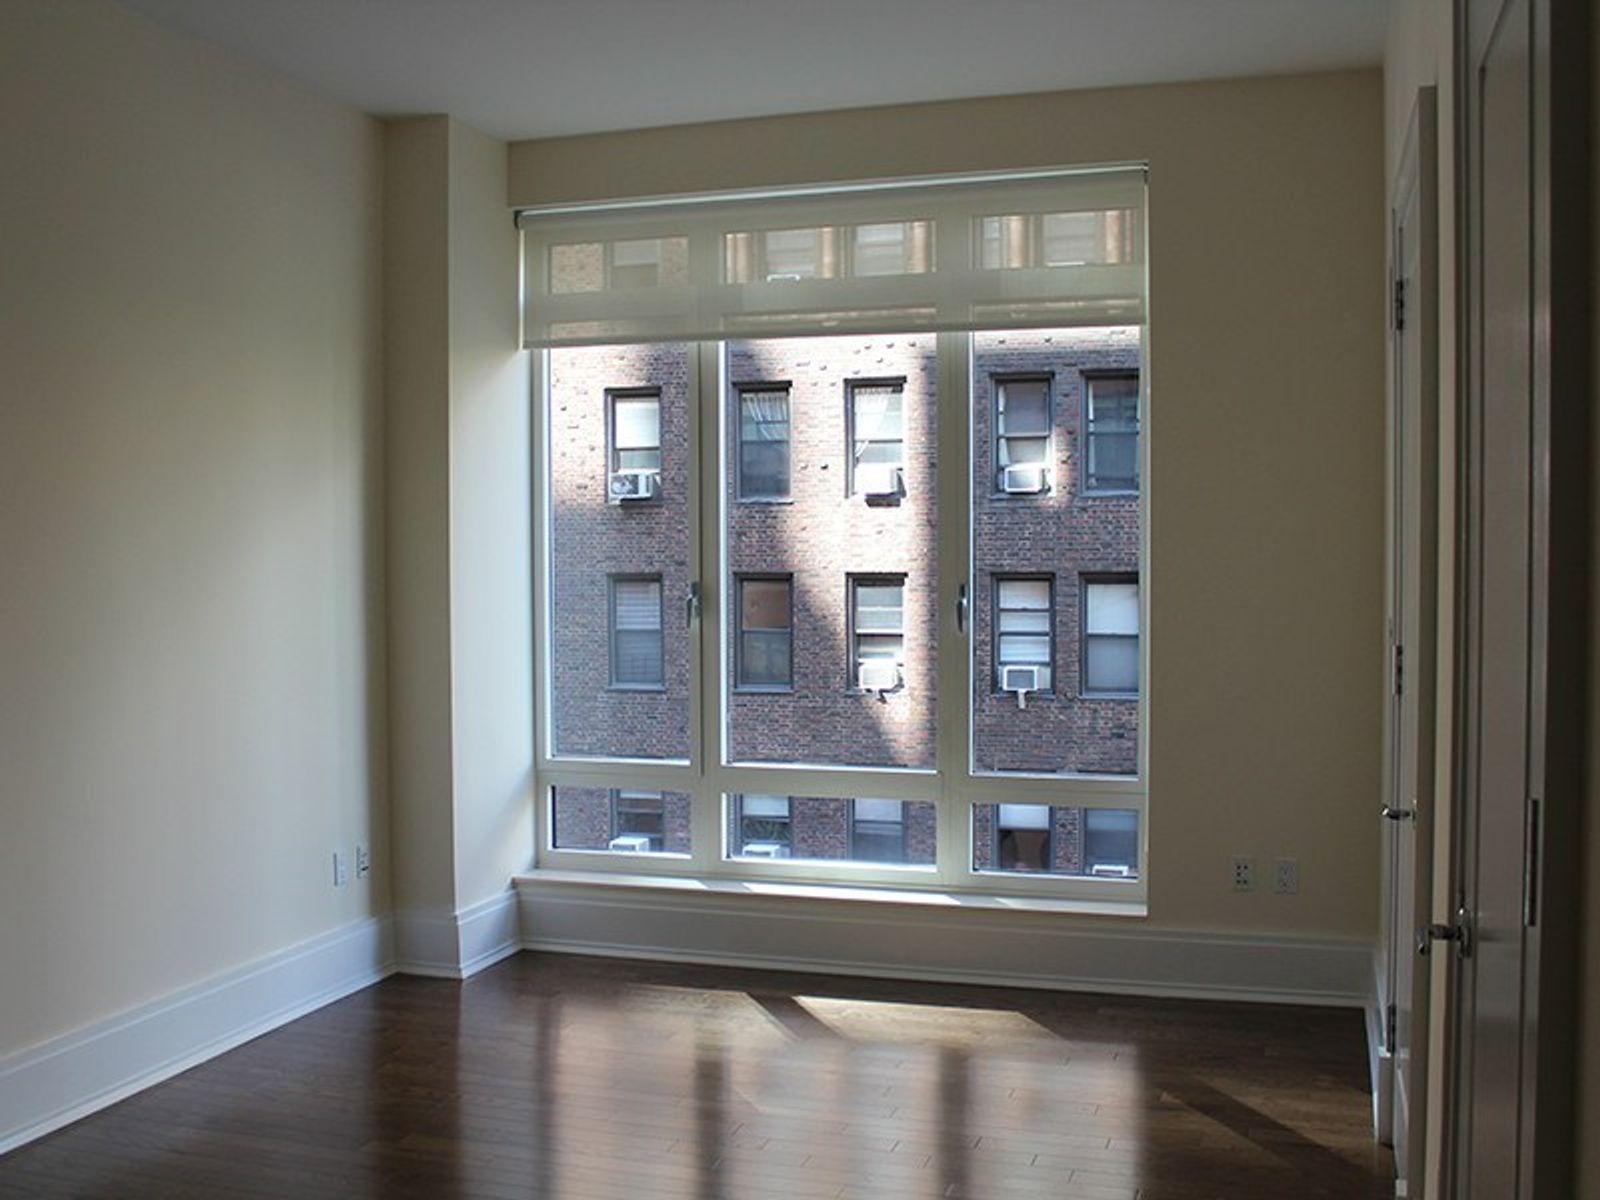 205 West 76th Street